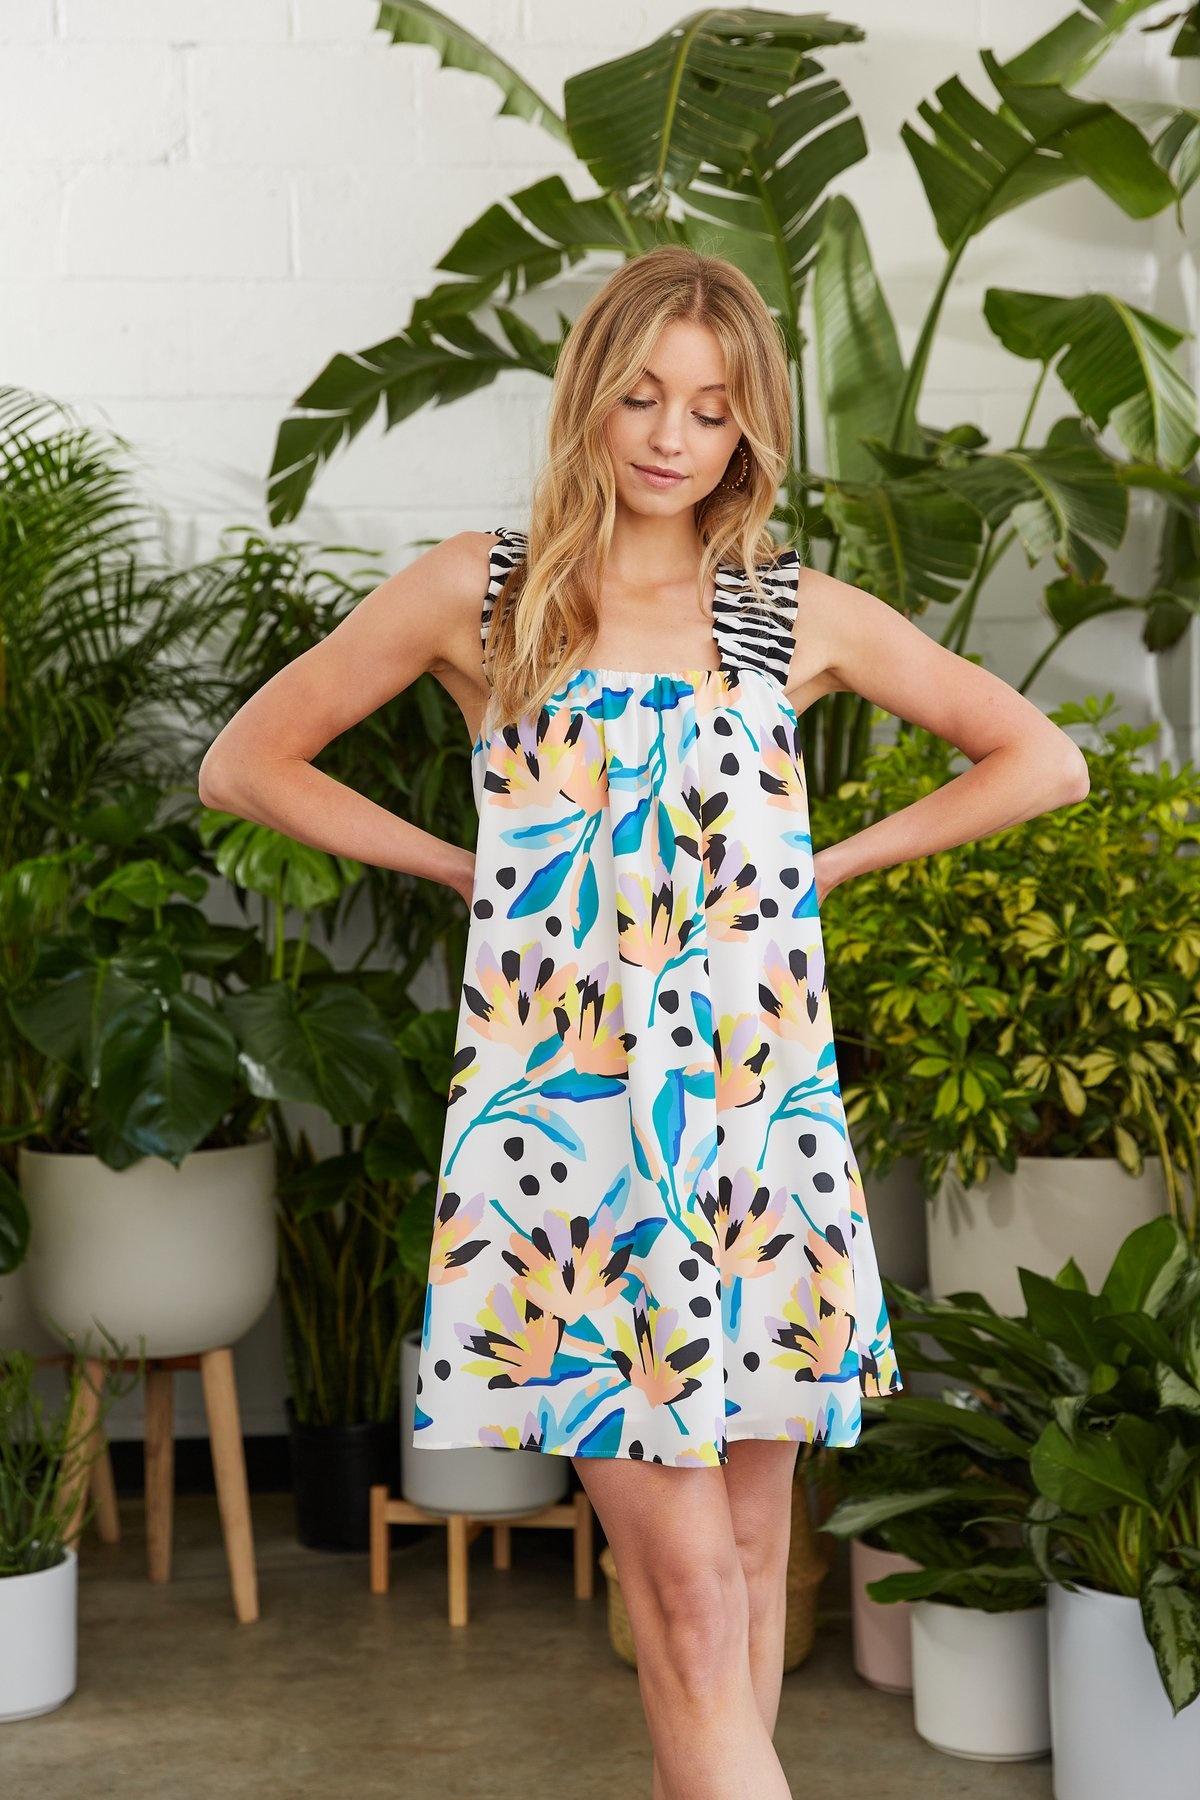 Crosby By Mollie Burch Otto Dress in Island Lilies